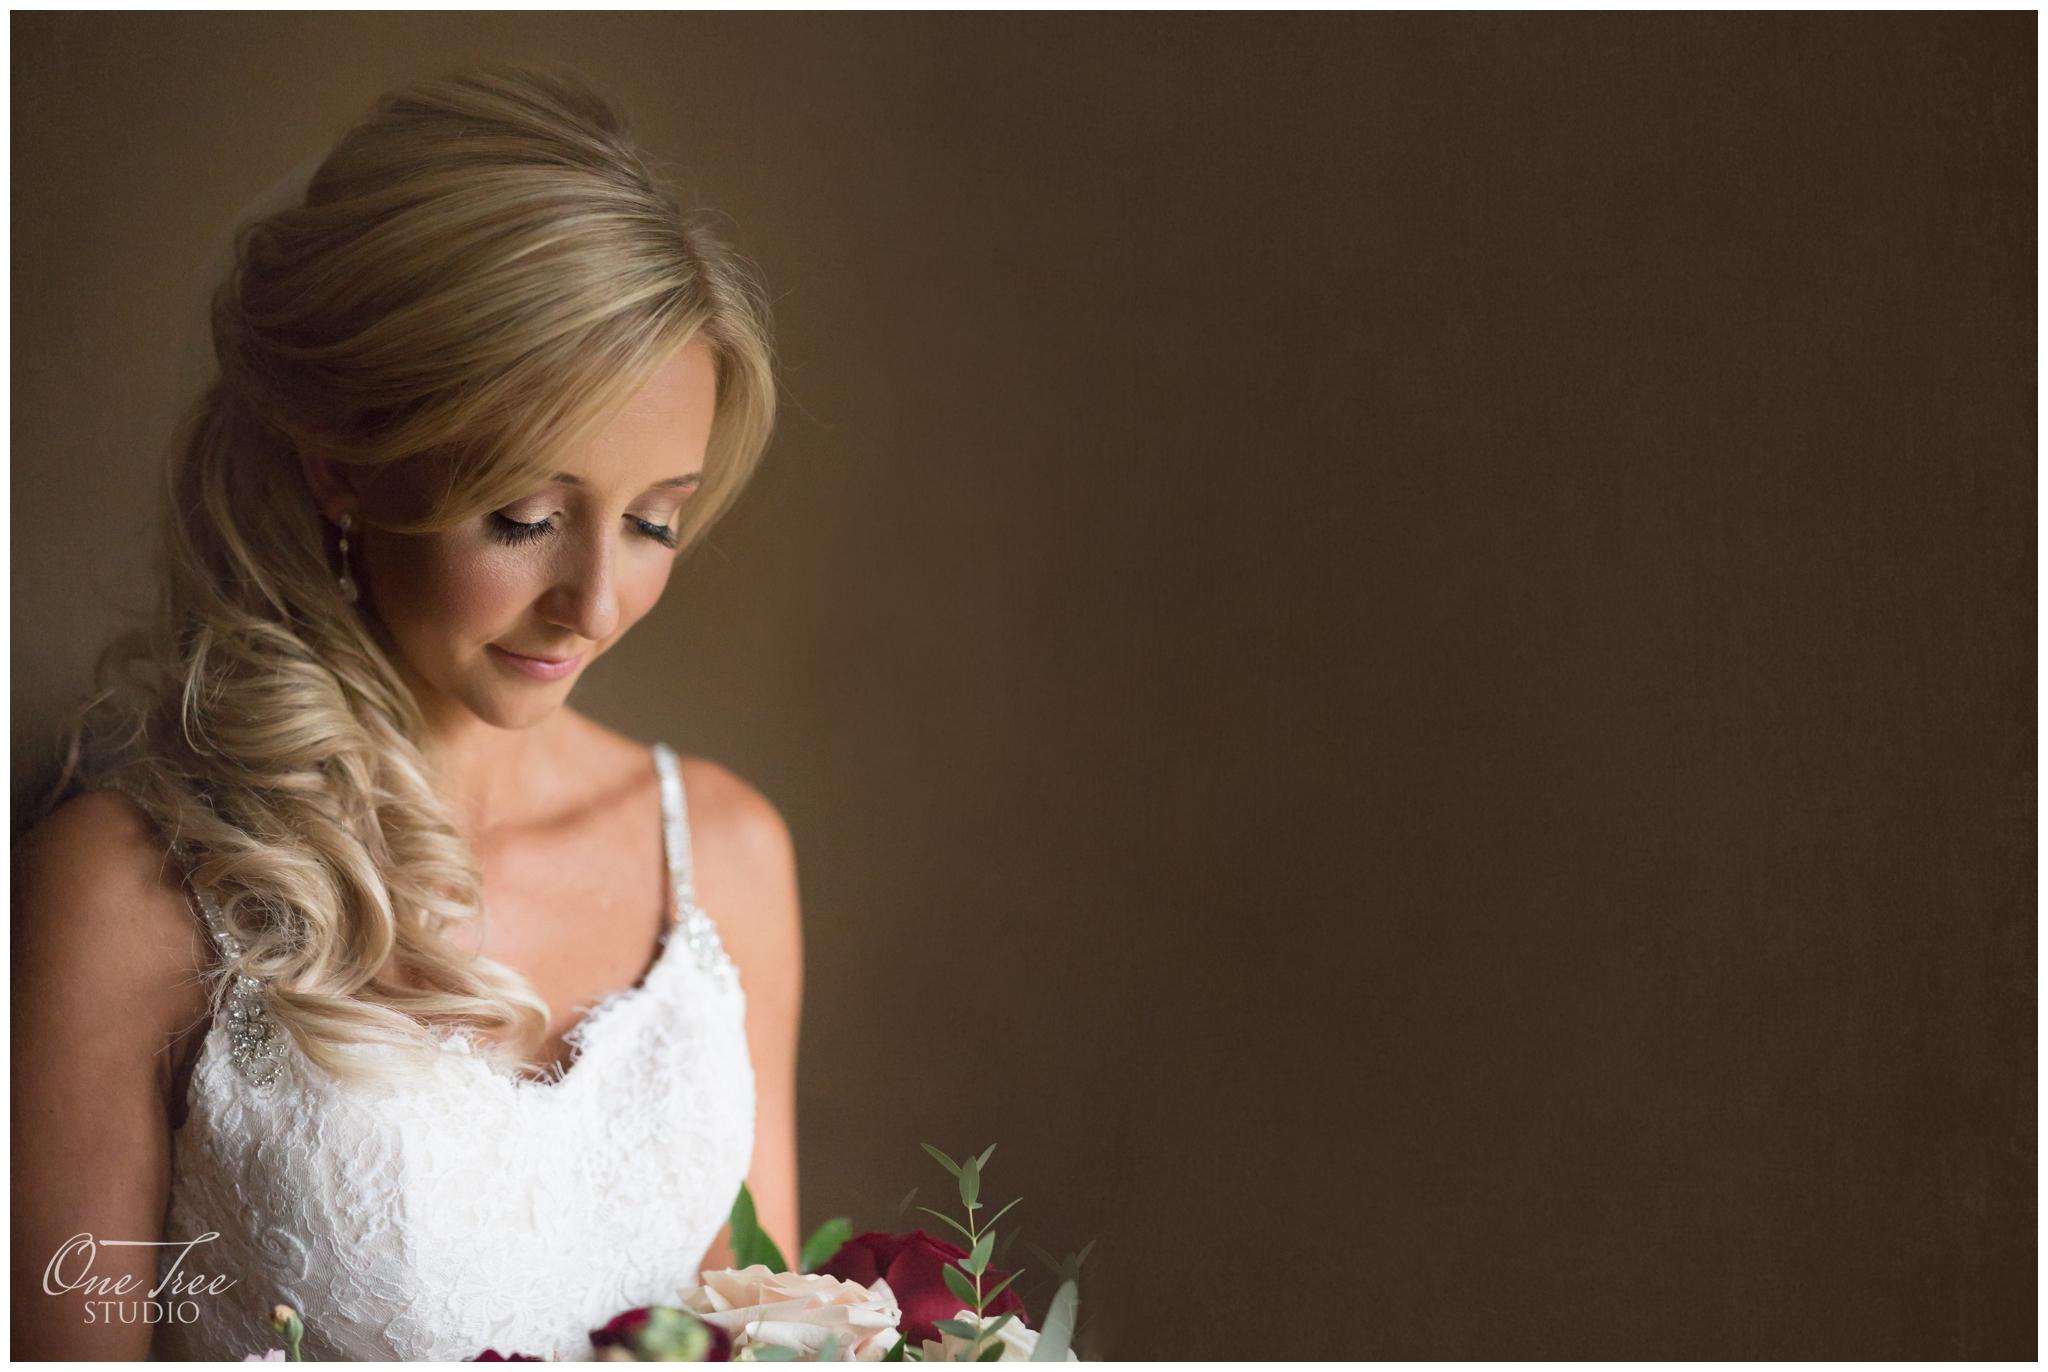 Bridal portrait   Markham Wedding Photographer   One Tree Studio Inc.